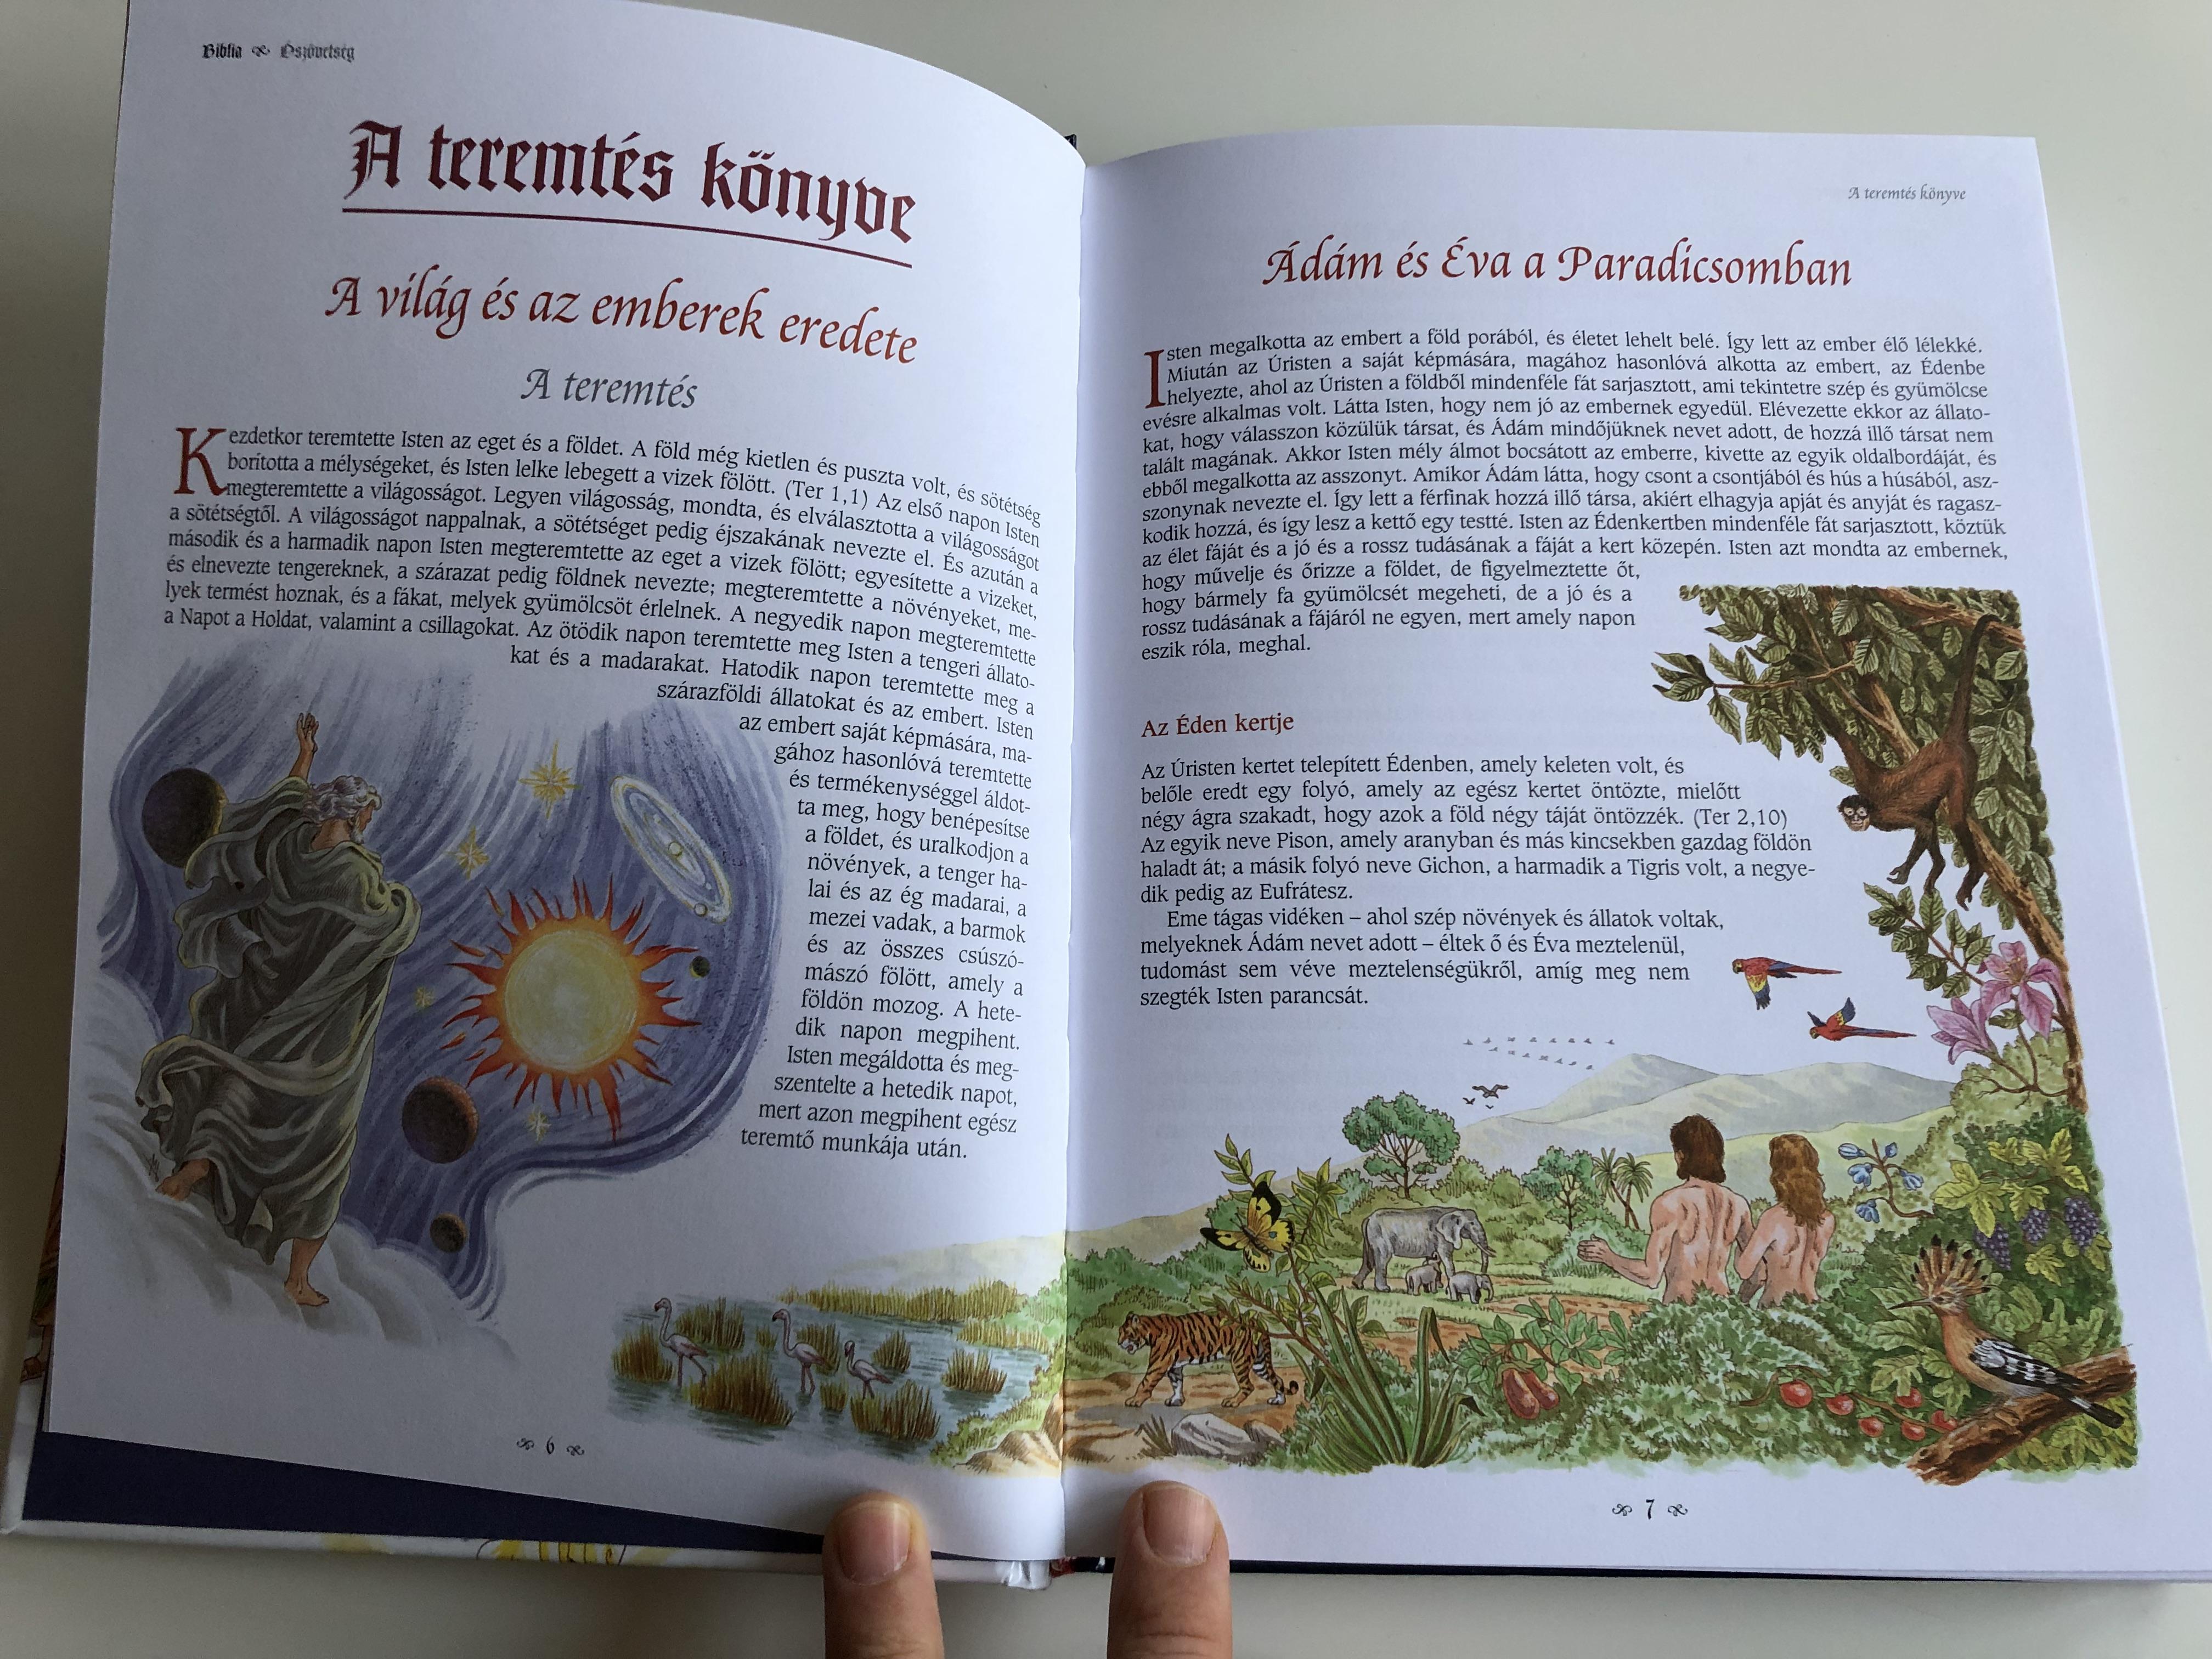 biblia-gyermekeknek-hungarian-bible-for-children-editor-campos-jim-nez-m-ria-hardcover-2010-napraforg-kiad-3-.jpg